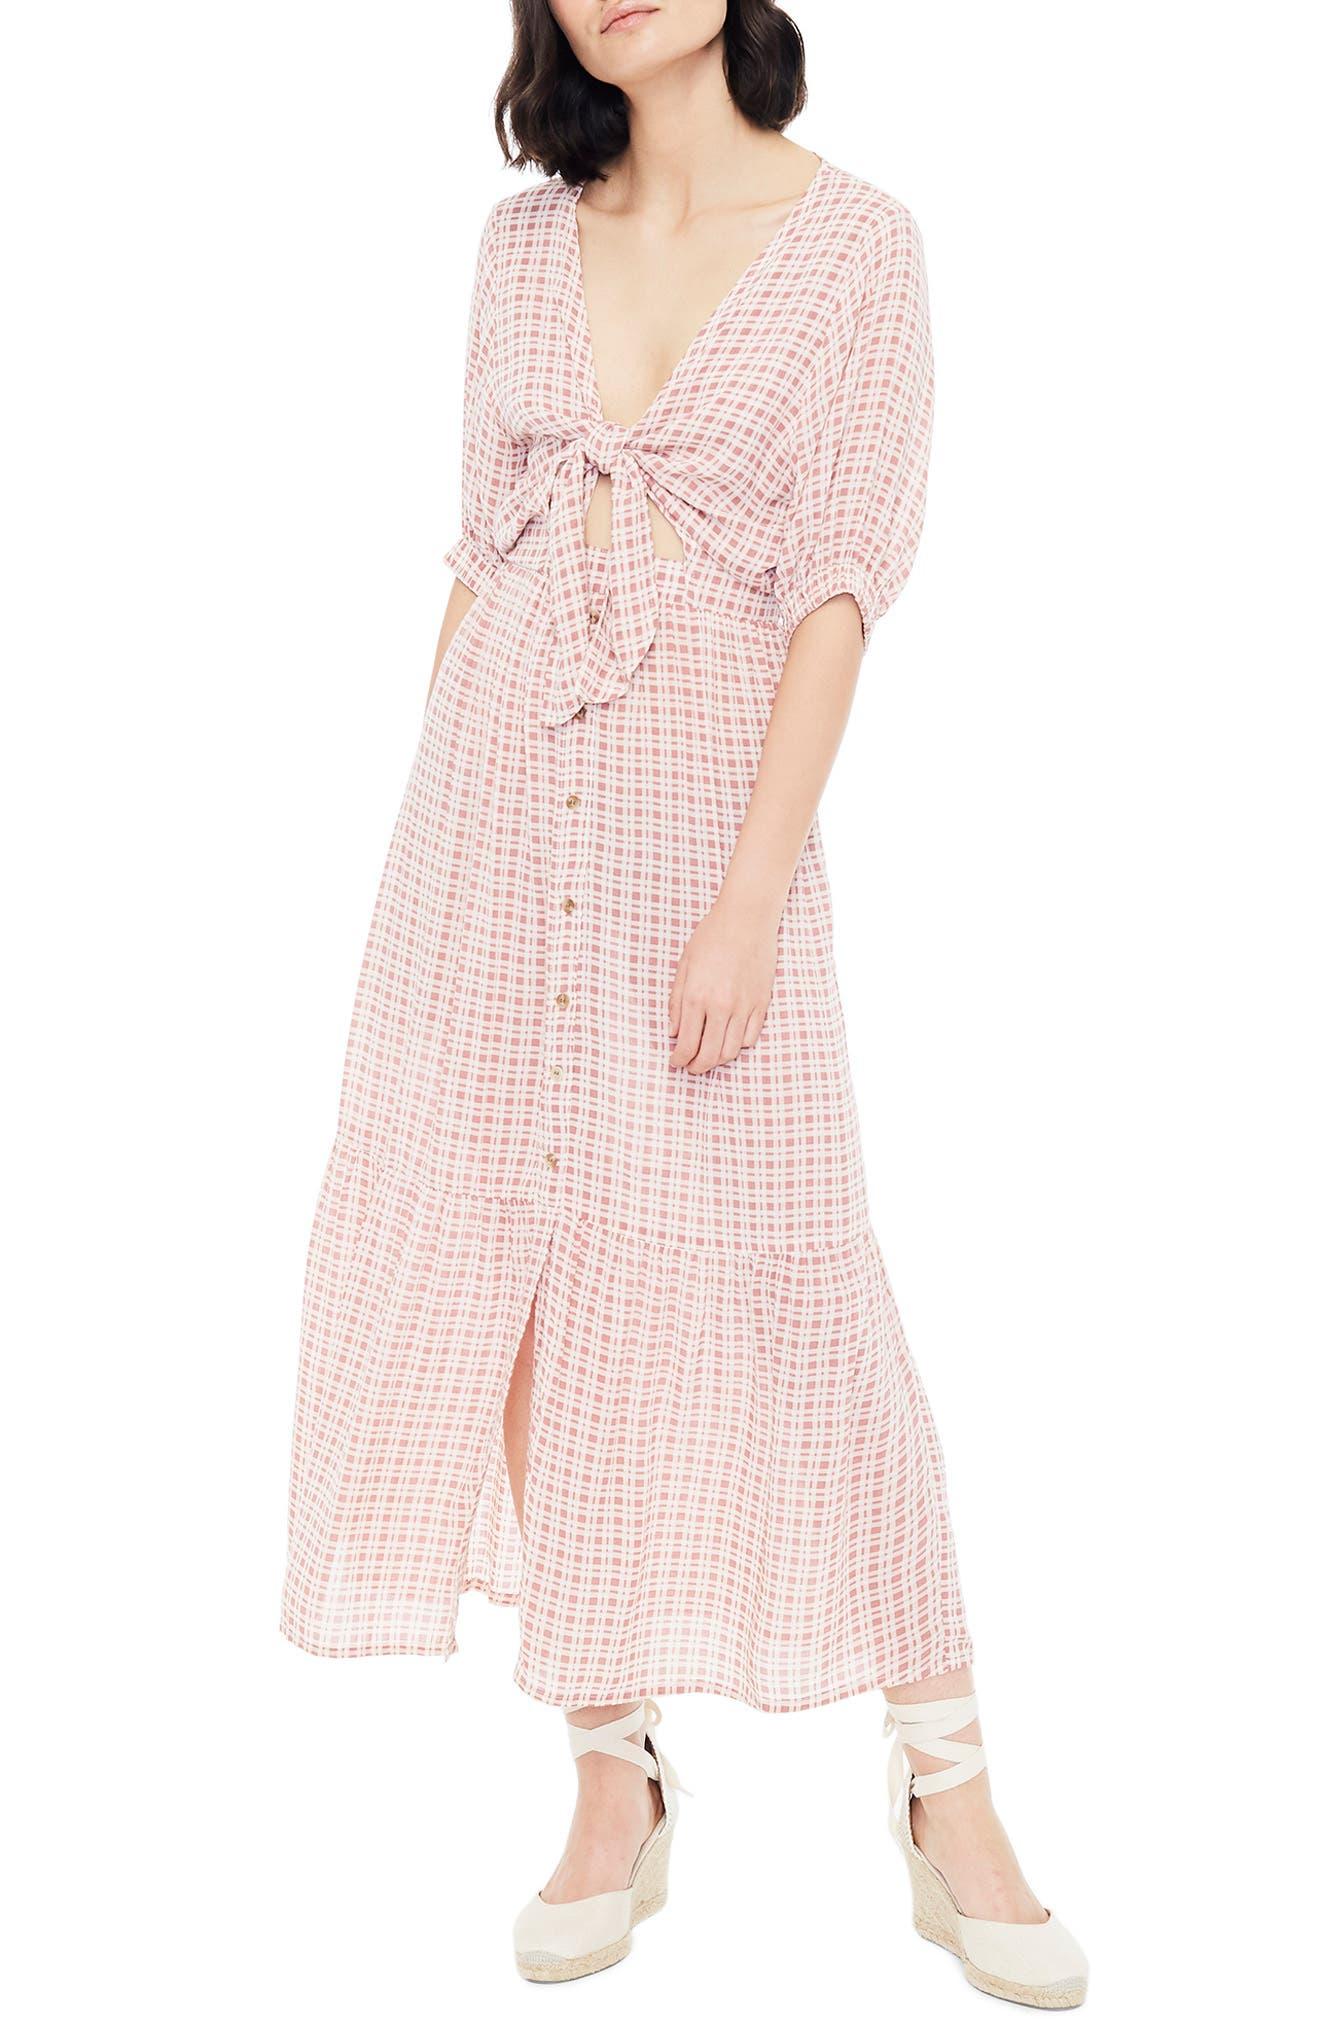 FAITHFULL THE BRAND Maple Midi Dress, Main, color, EMILINAH CHECK PRINT